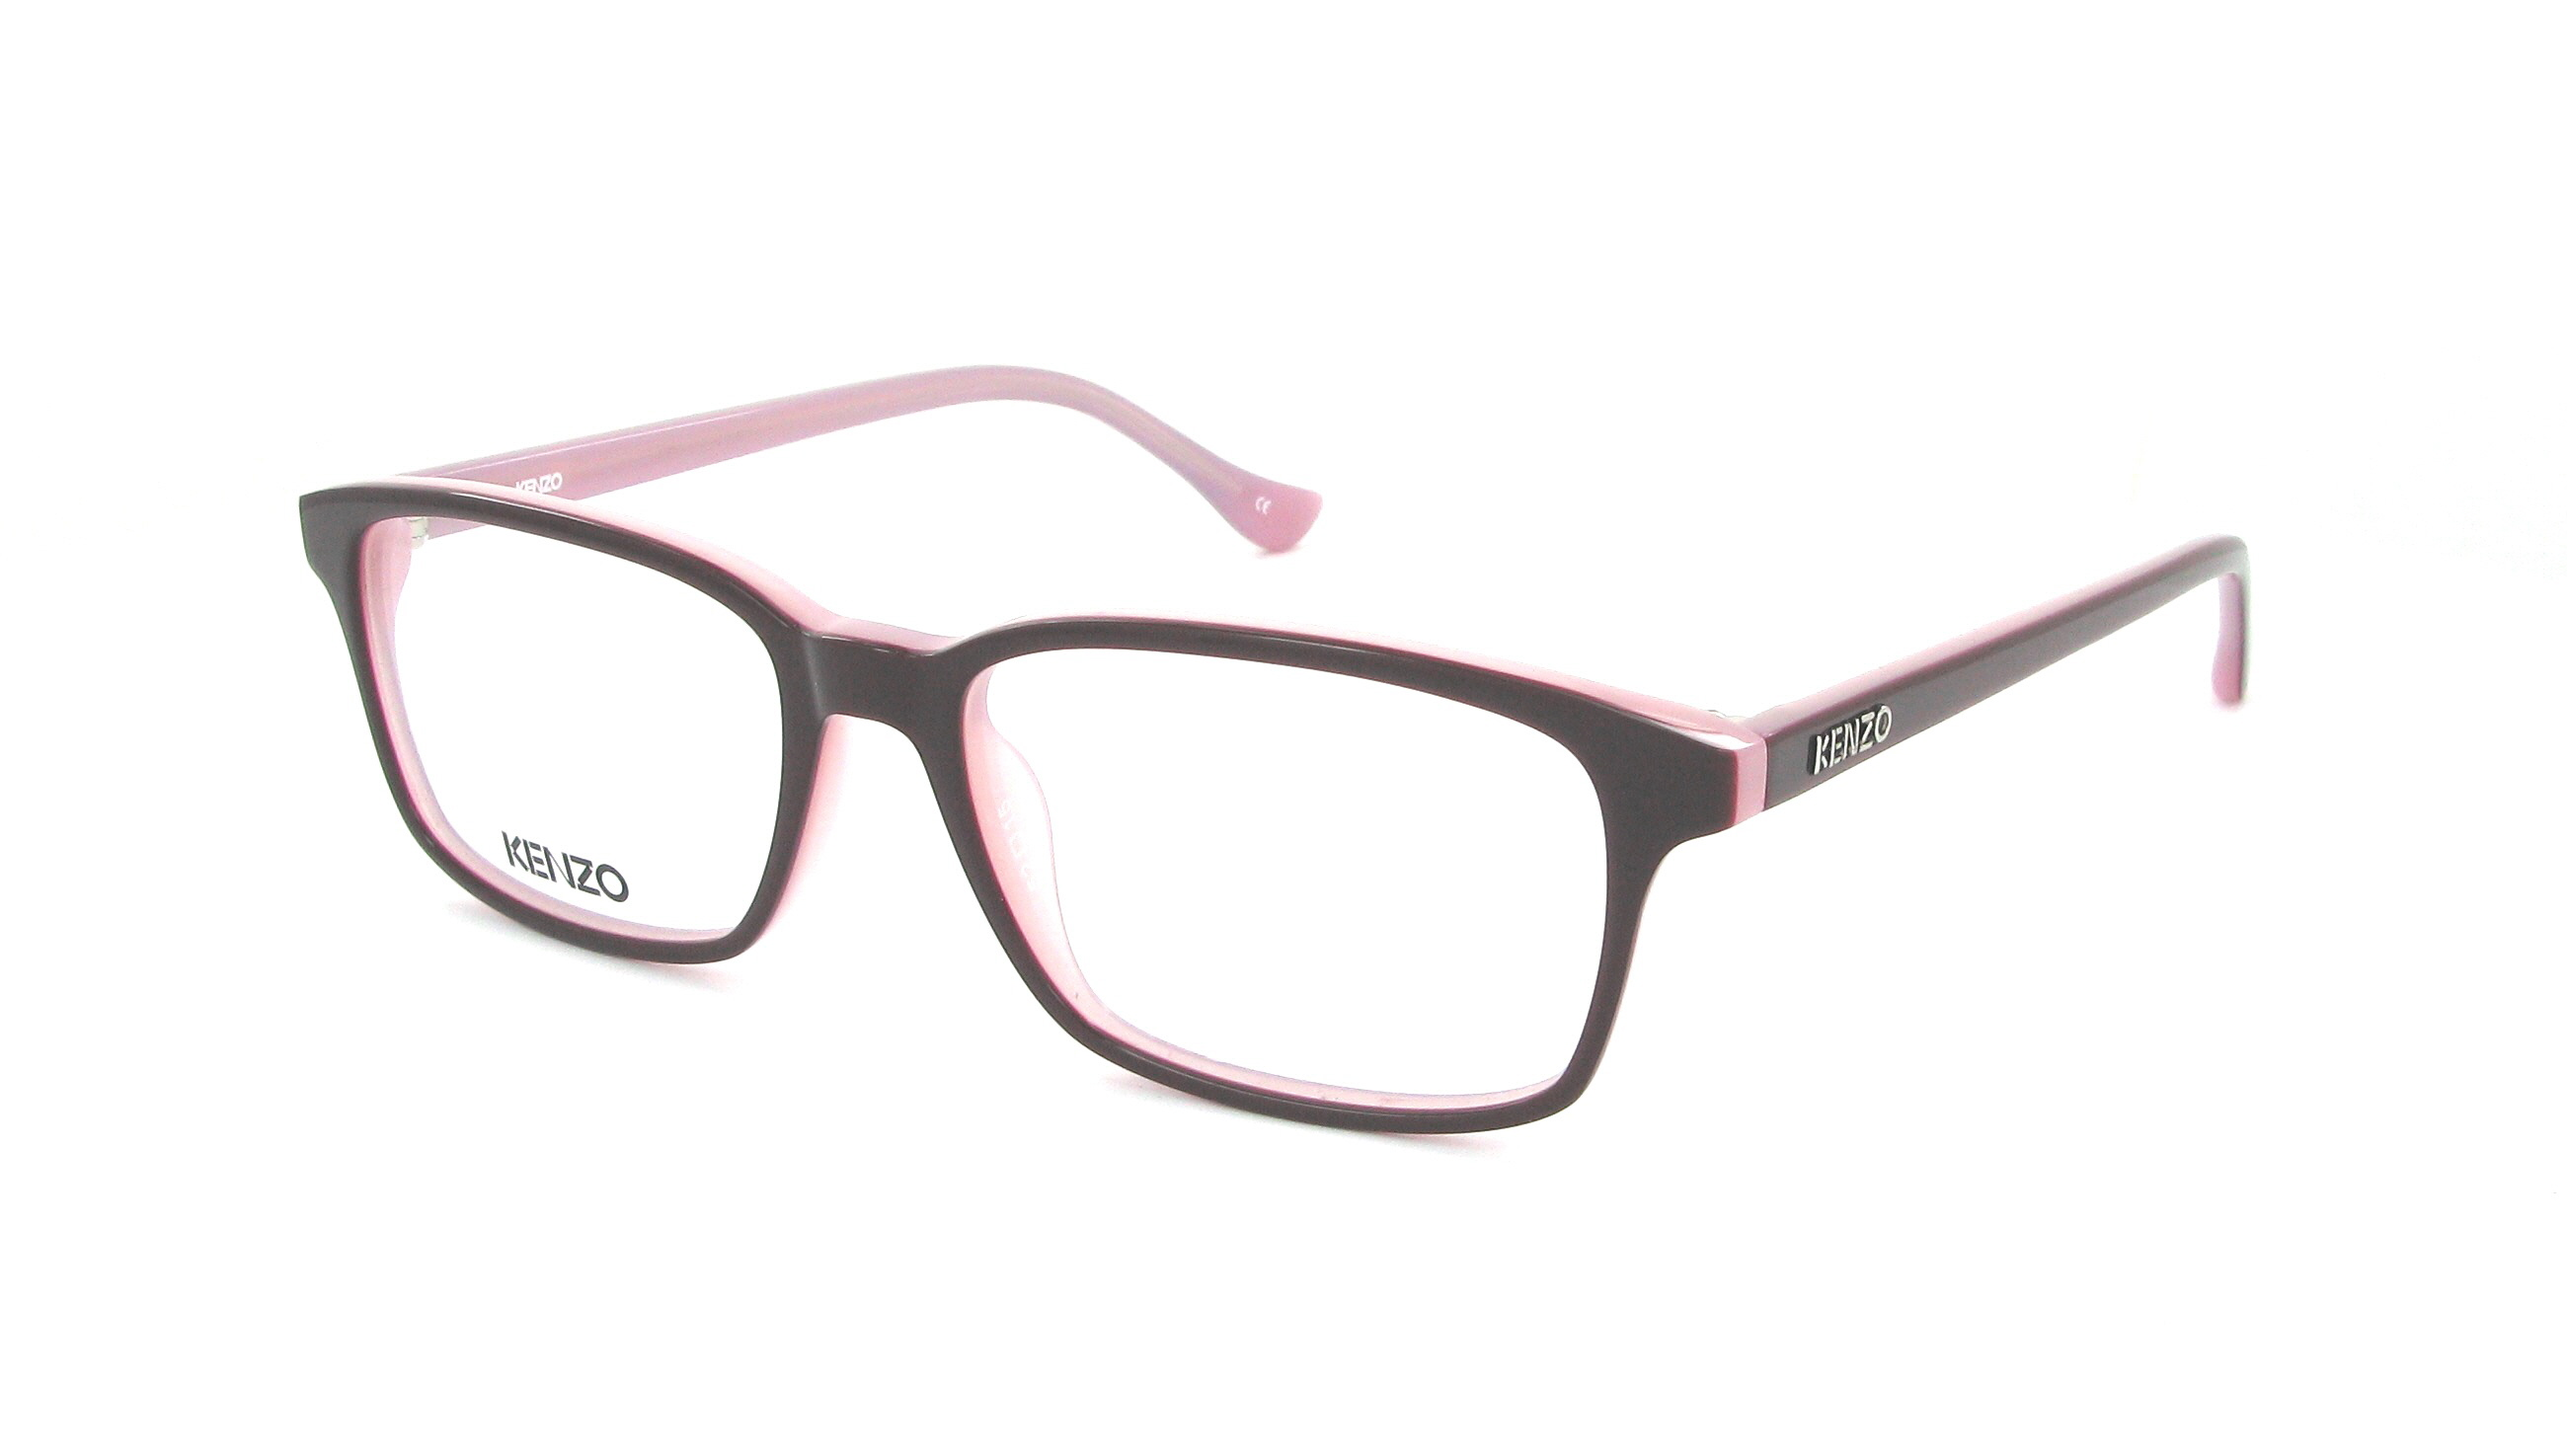 lunette-de-vue-femme-12.jpg